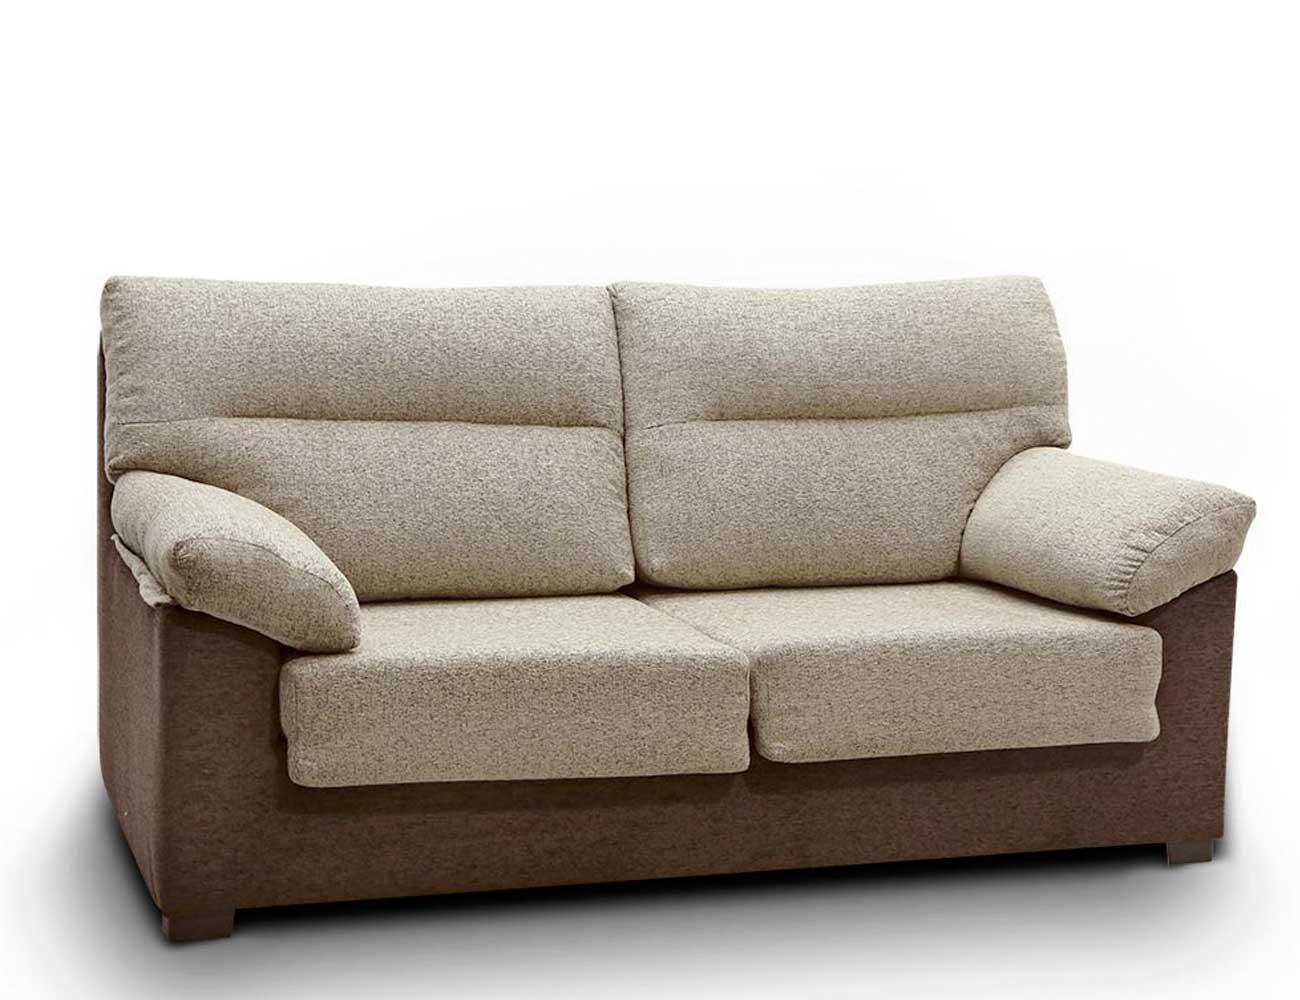 Sofa 3 plazas barato6